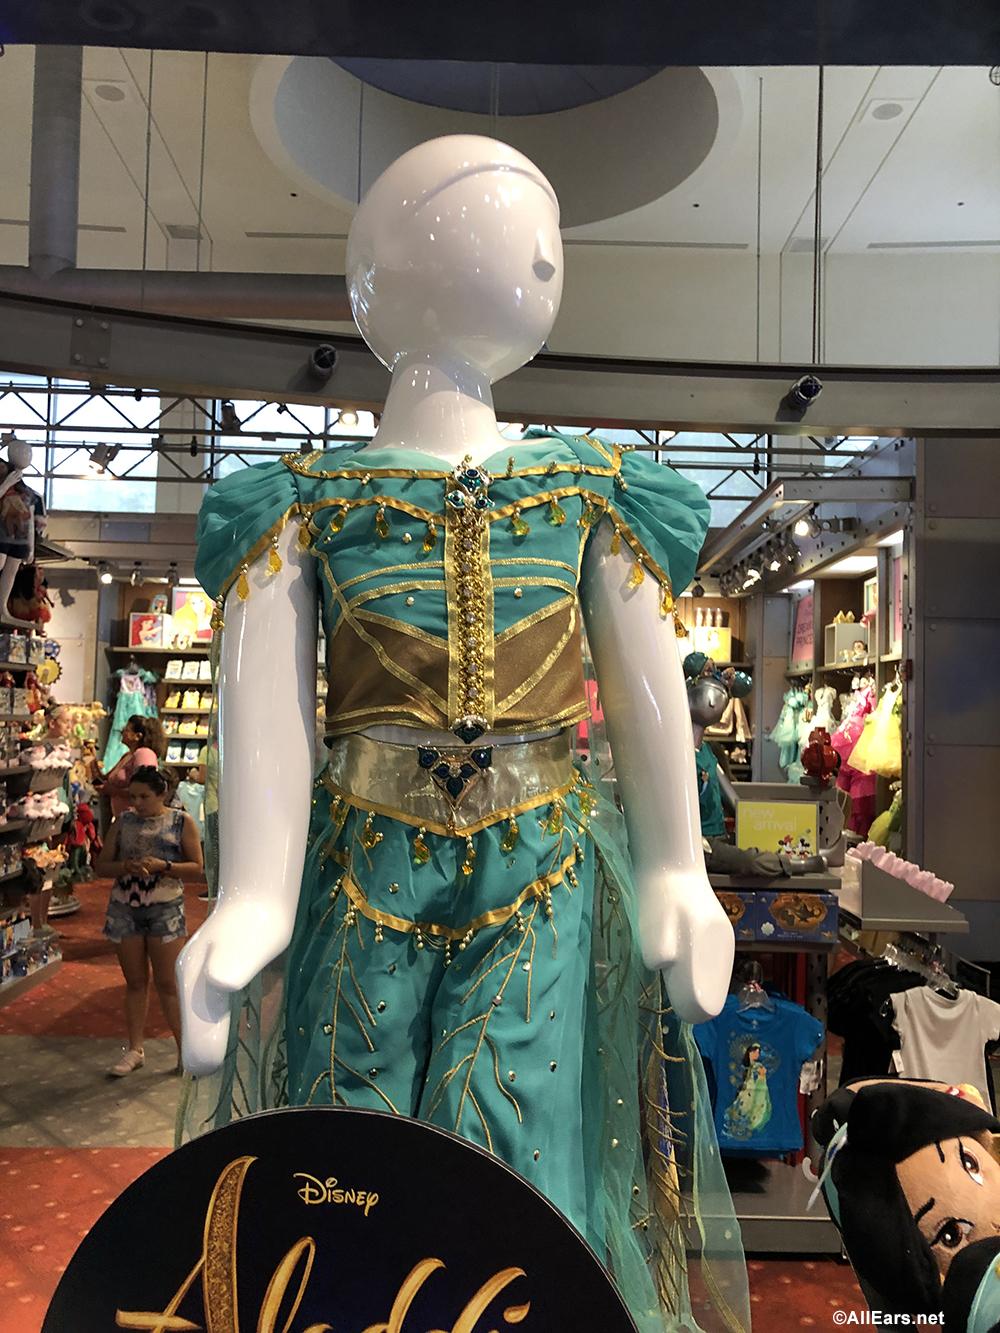 New Aladdin Inspired Merchandise Materializes In Disney